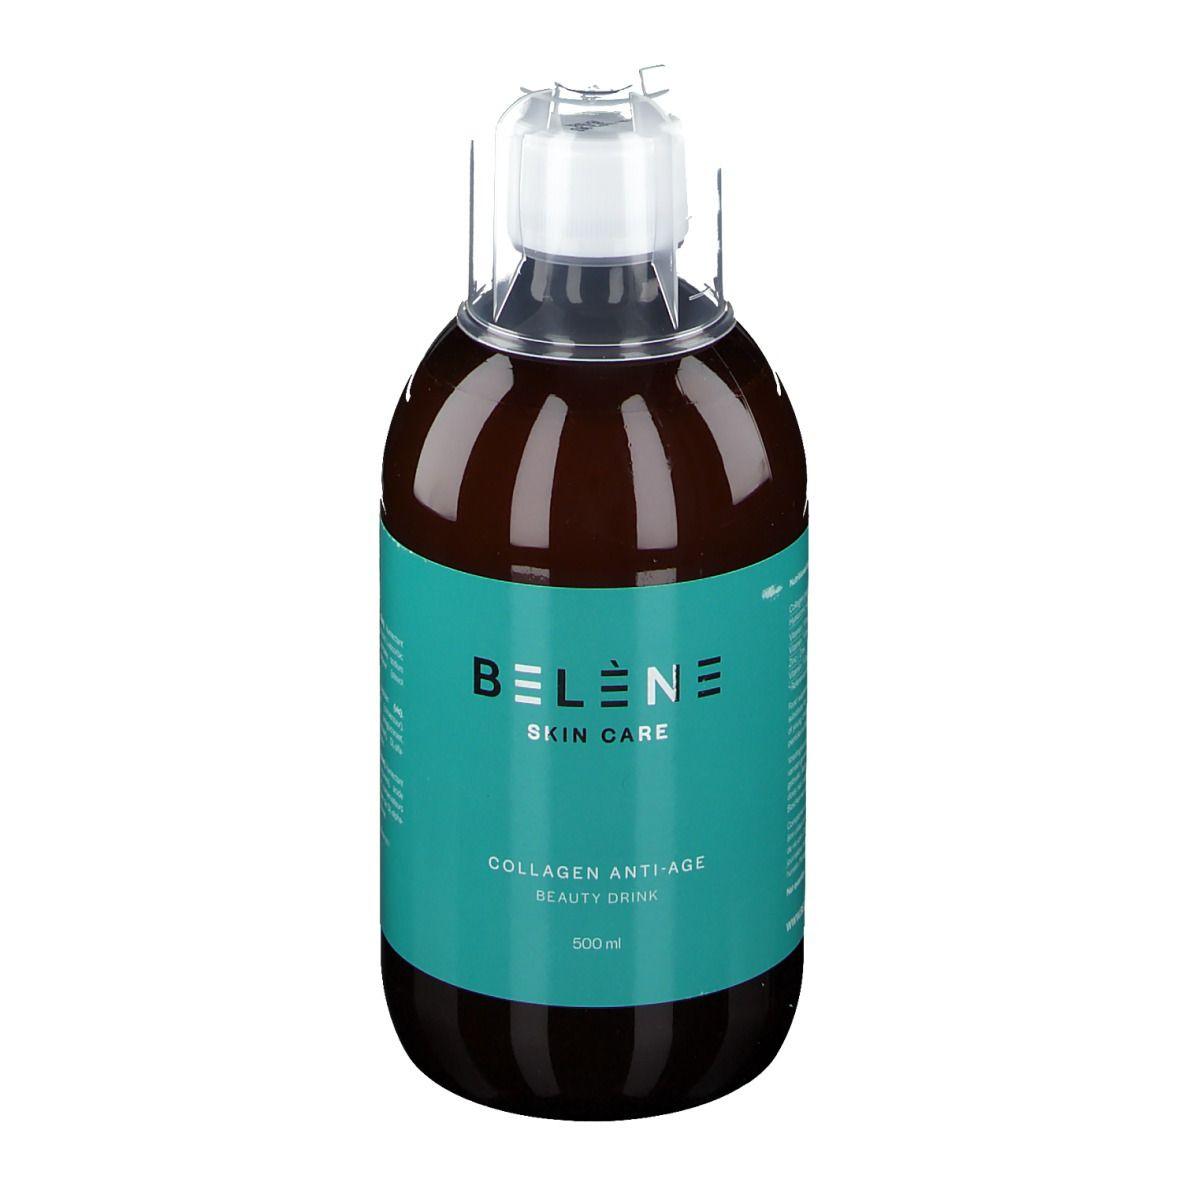 Image of BELENE Collagen Anti-Age Beauty Drink mit Kollagenanteil